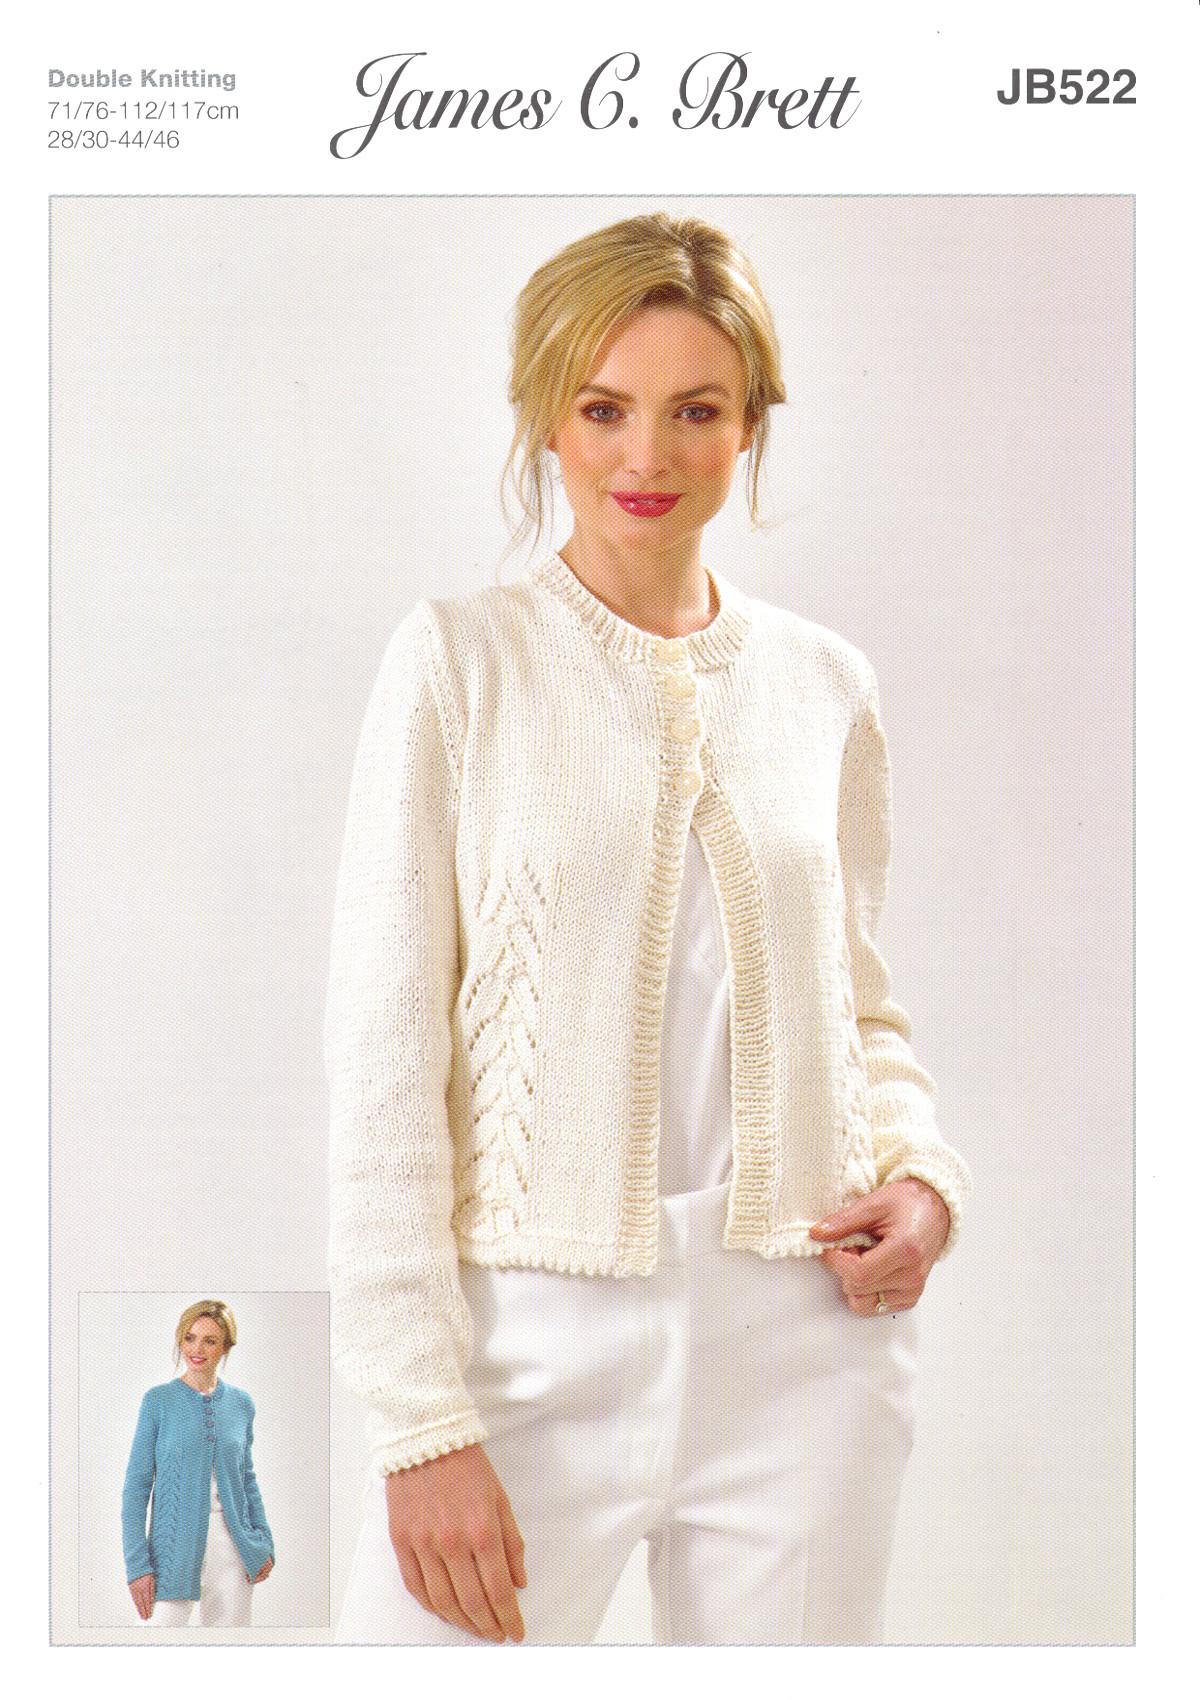 fe12414bd Details about James Brett Womens Knitting Pattern Glisten DK Long or Short Lace  Cardigan JB522